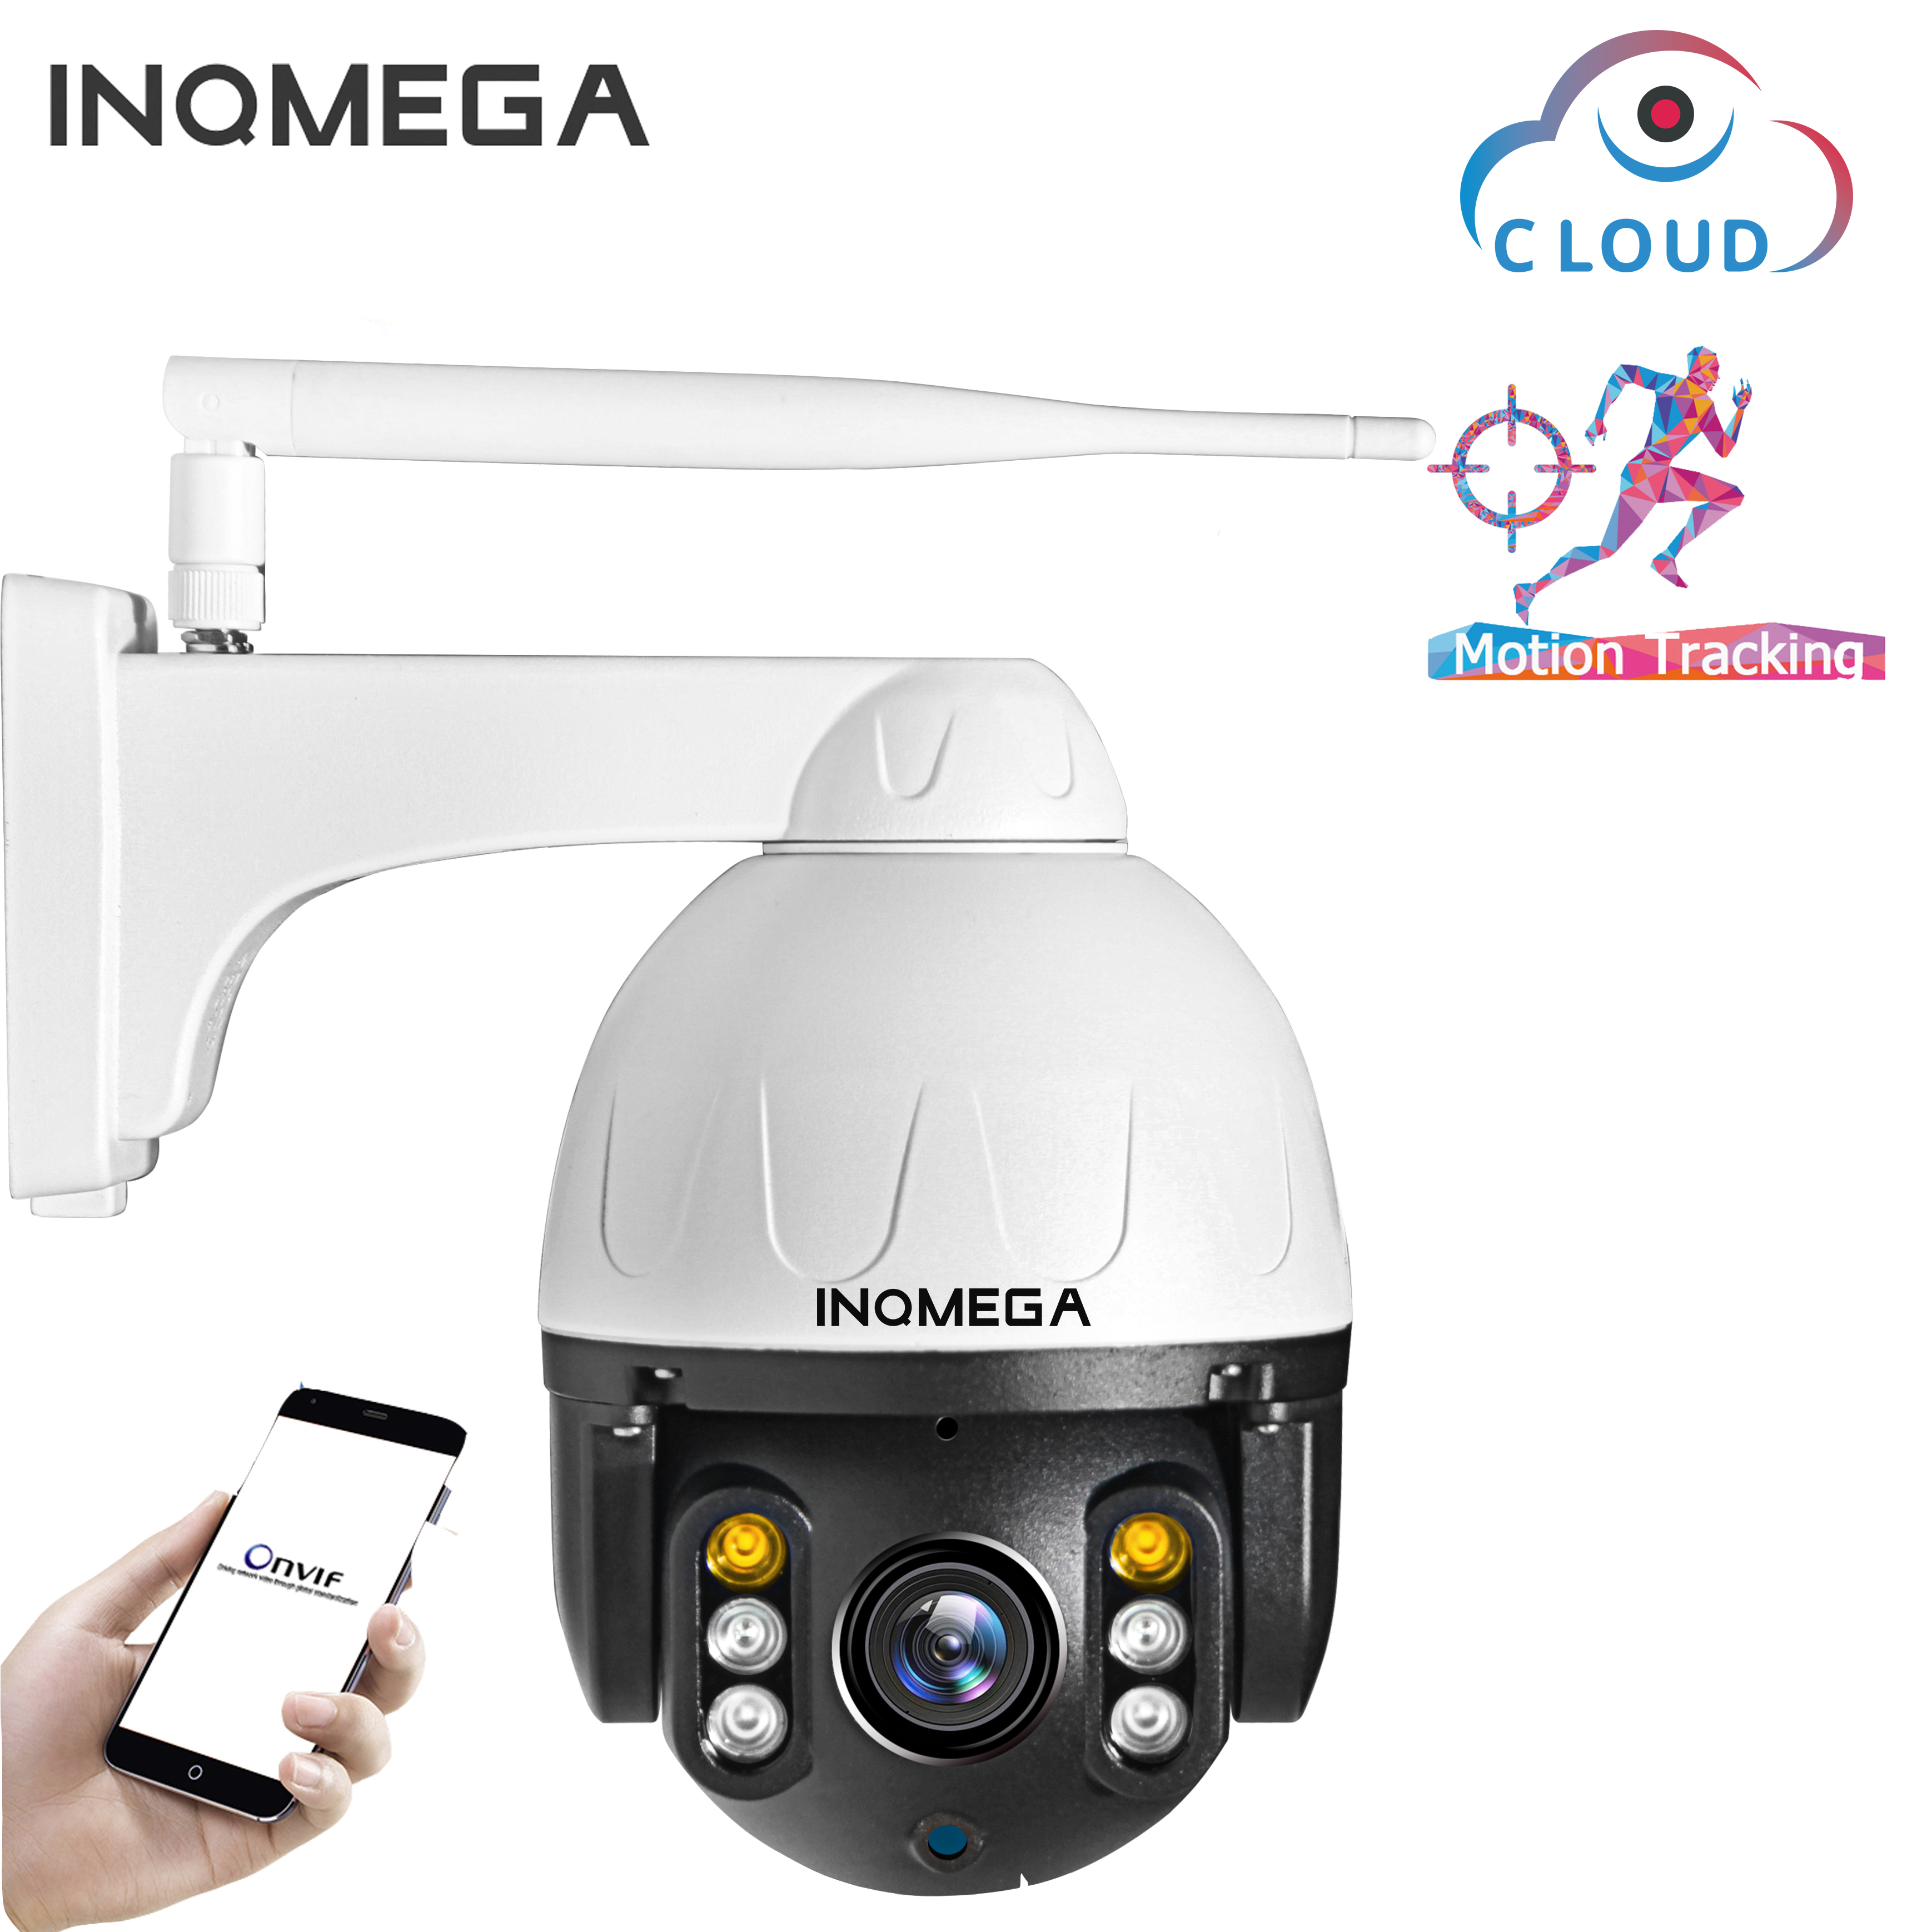 INQMEGA Wolke 1080P Outdoor PTZ IP Kamera WIFI Speed Dome Auto Tracking Kamera 4X Digital Zoom 2MP Onvif IR CCTV Sicherheit Kamera